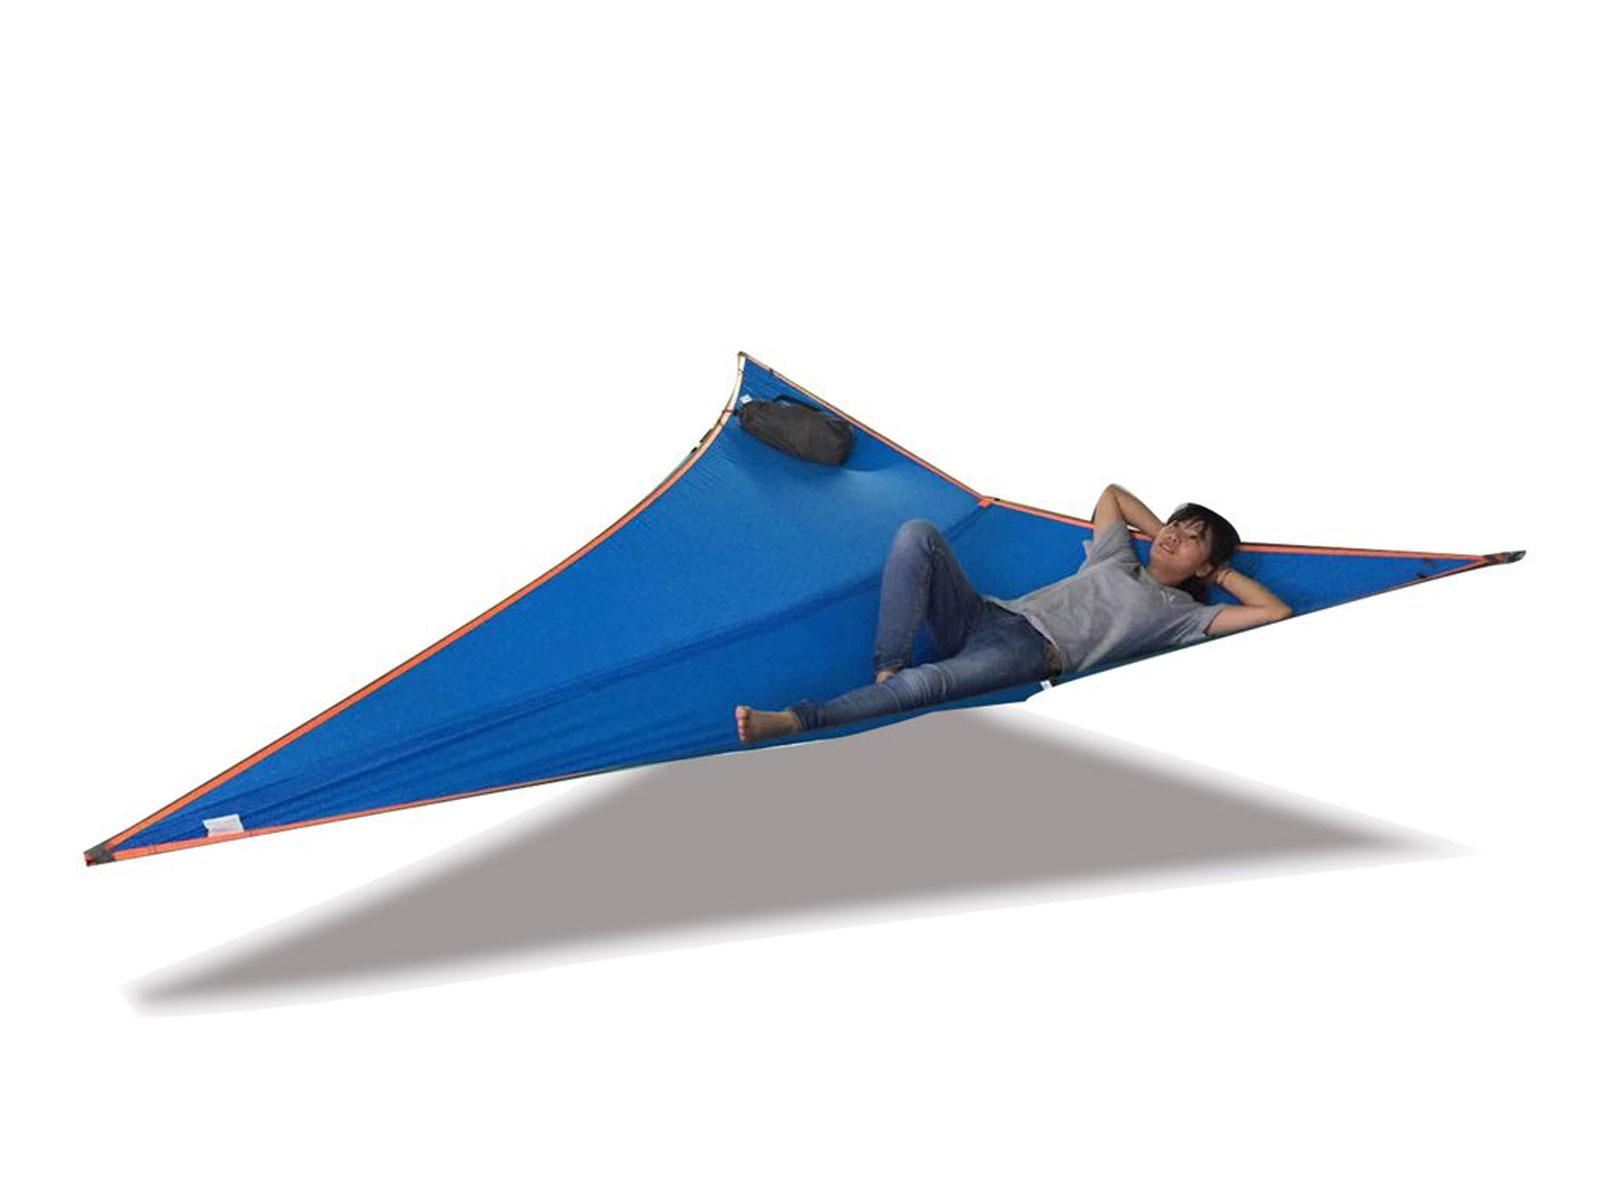 Tentsile T Mini Hammock Two Person Camping Suspended Tarp